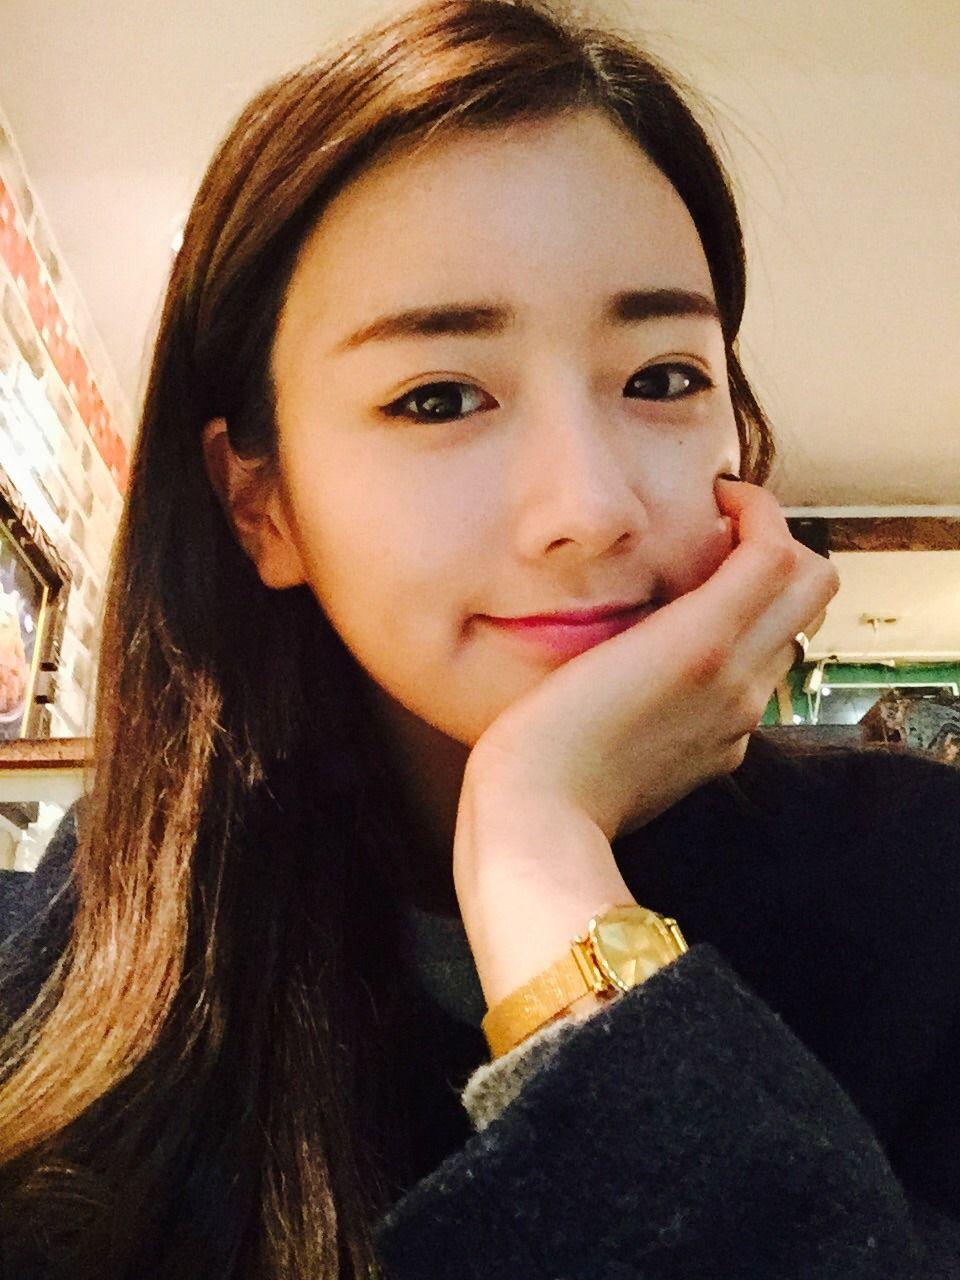 Apink bomi korean music idols pinterest korean music kpop